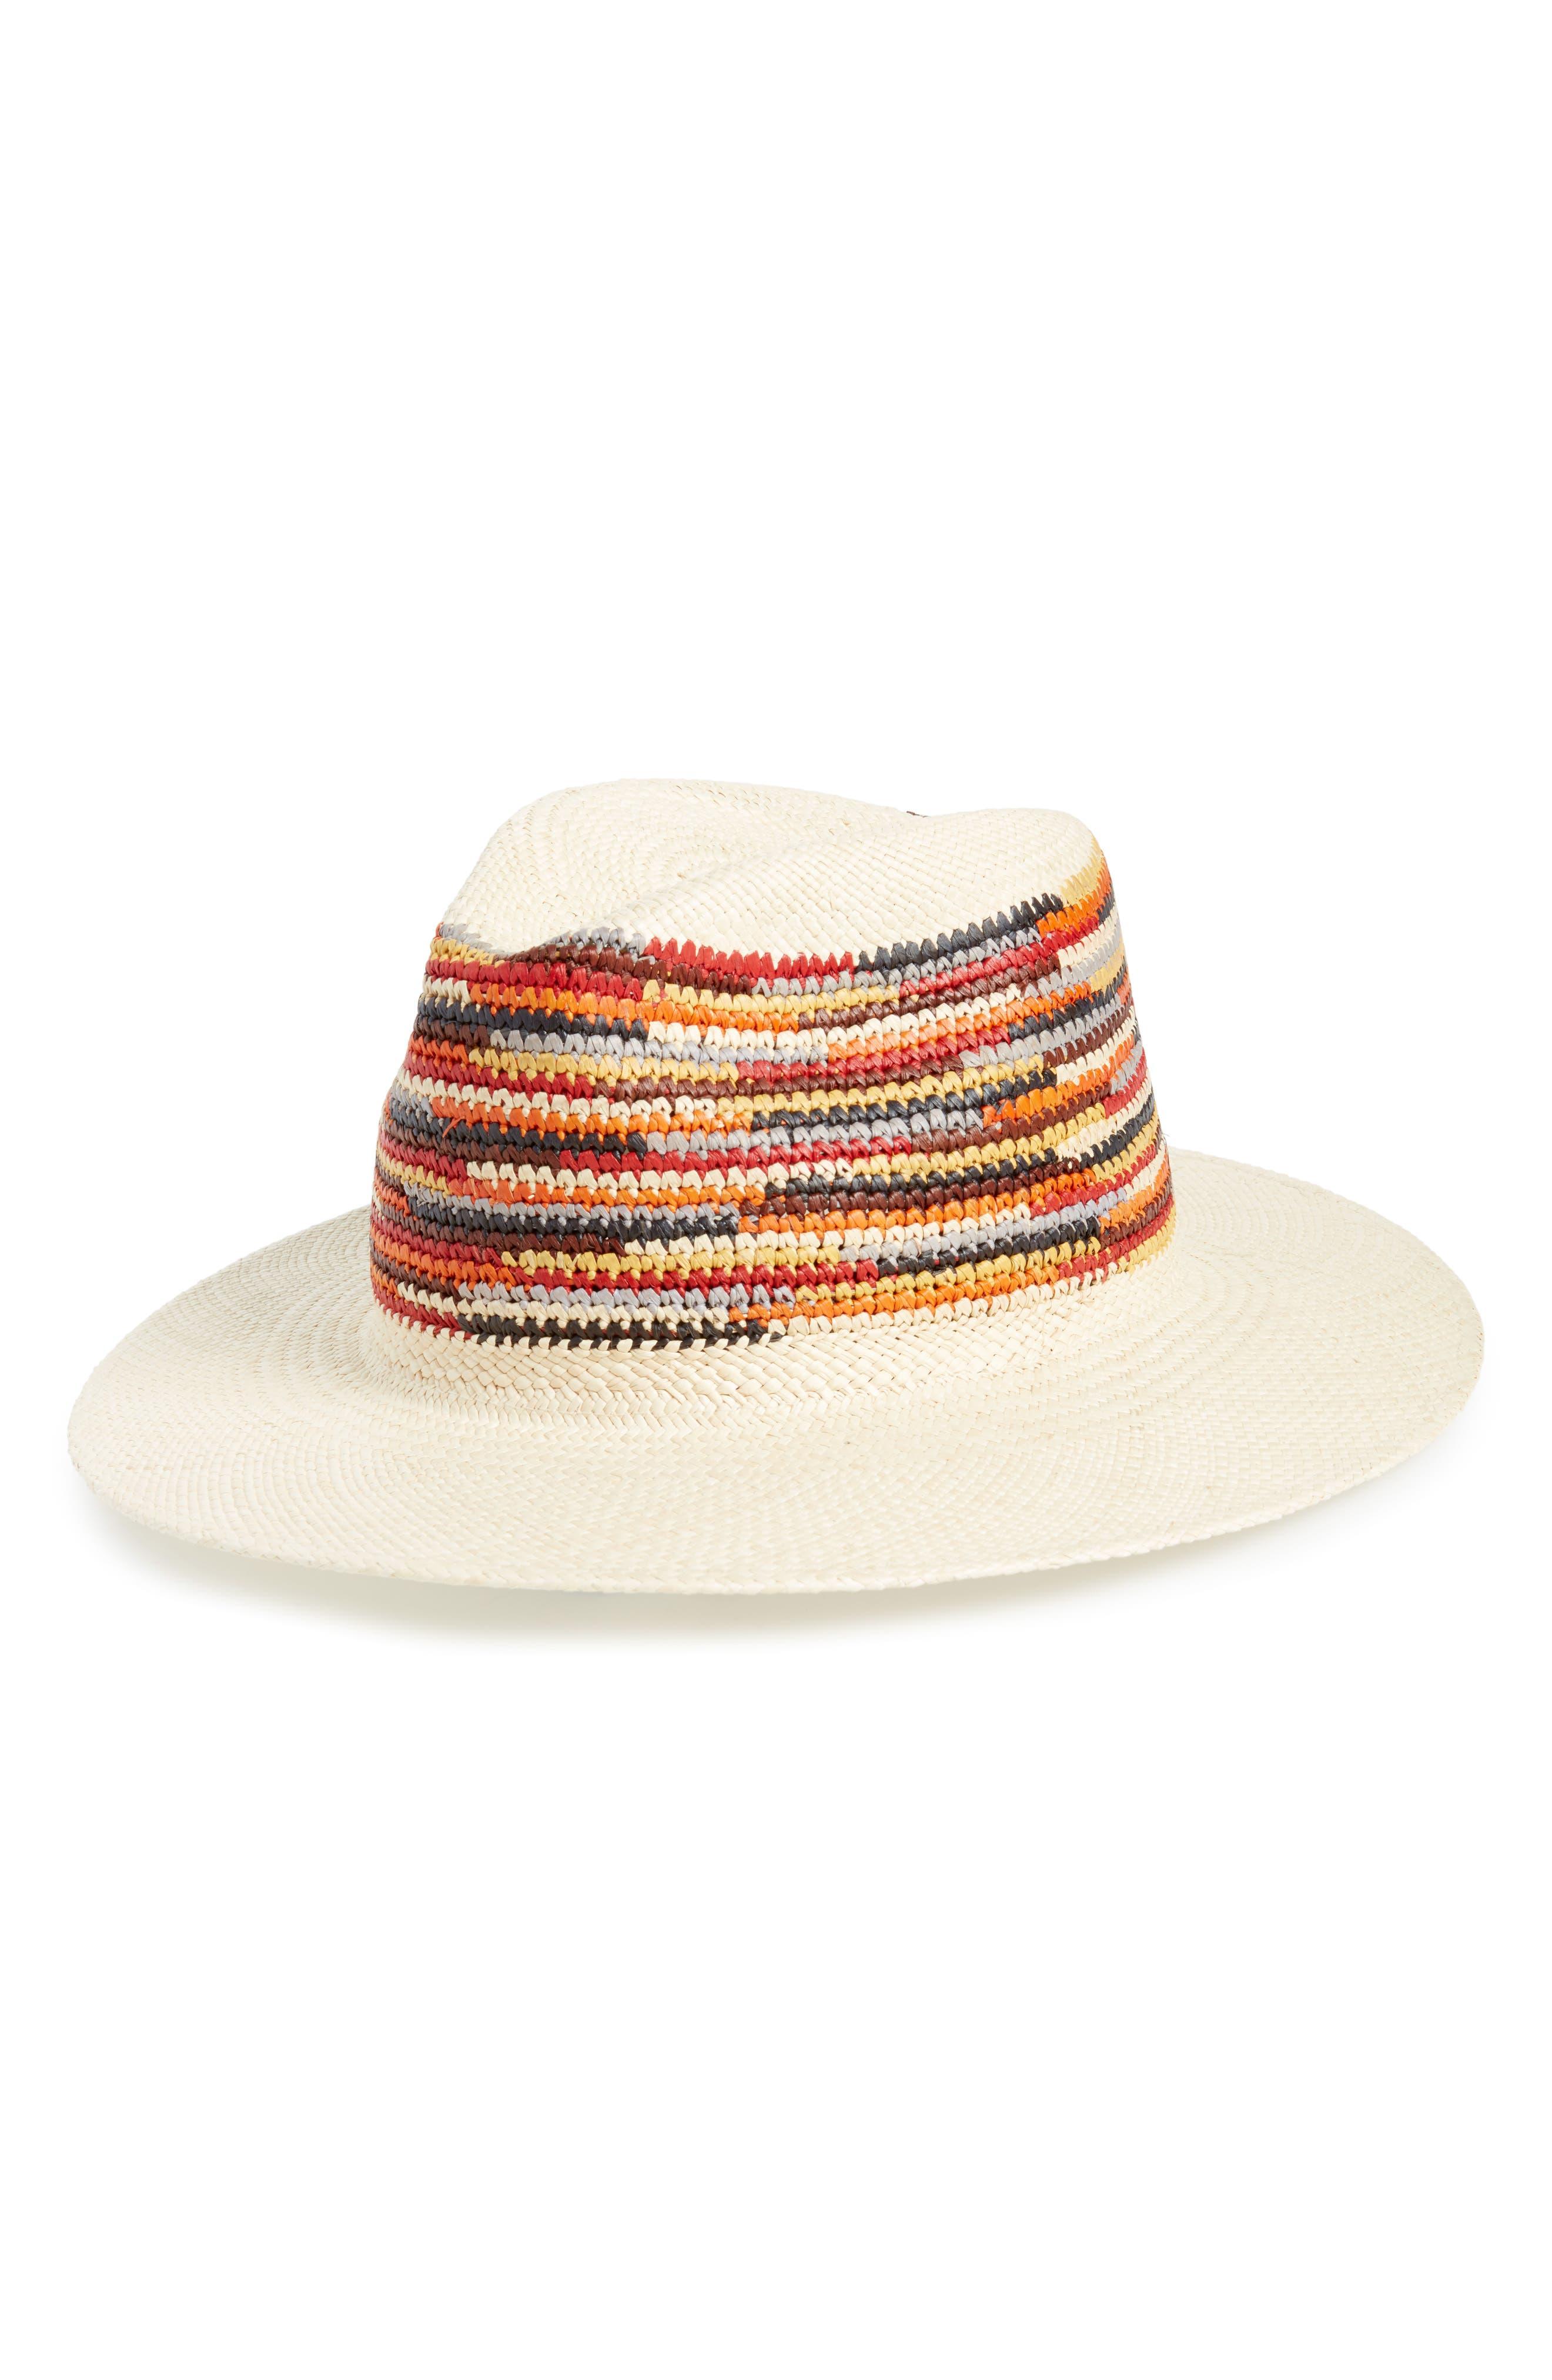 Panama Straw Hat,                             Main thumbnail 1, color,                             RED MULTI